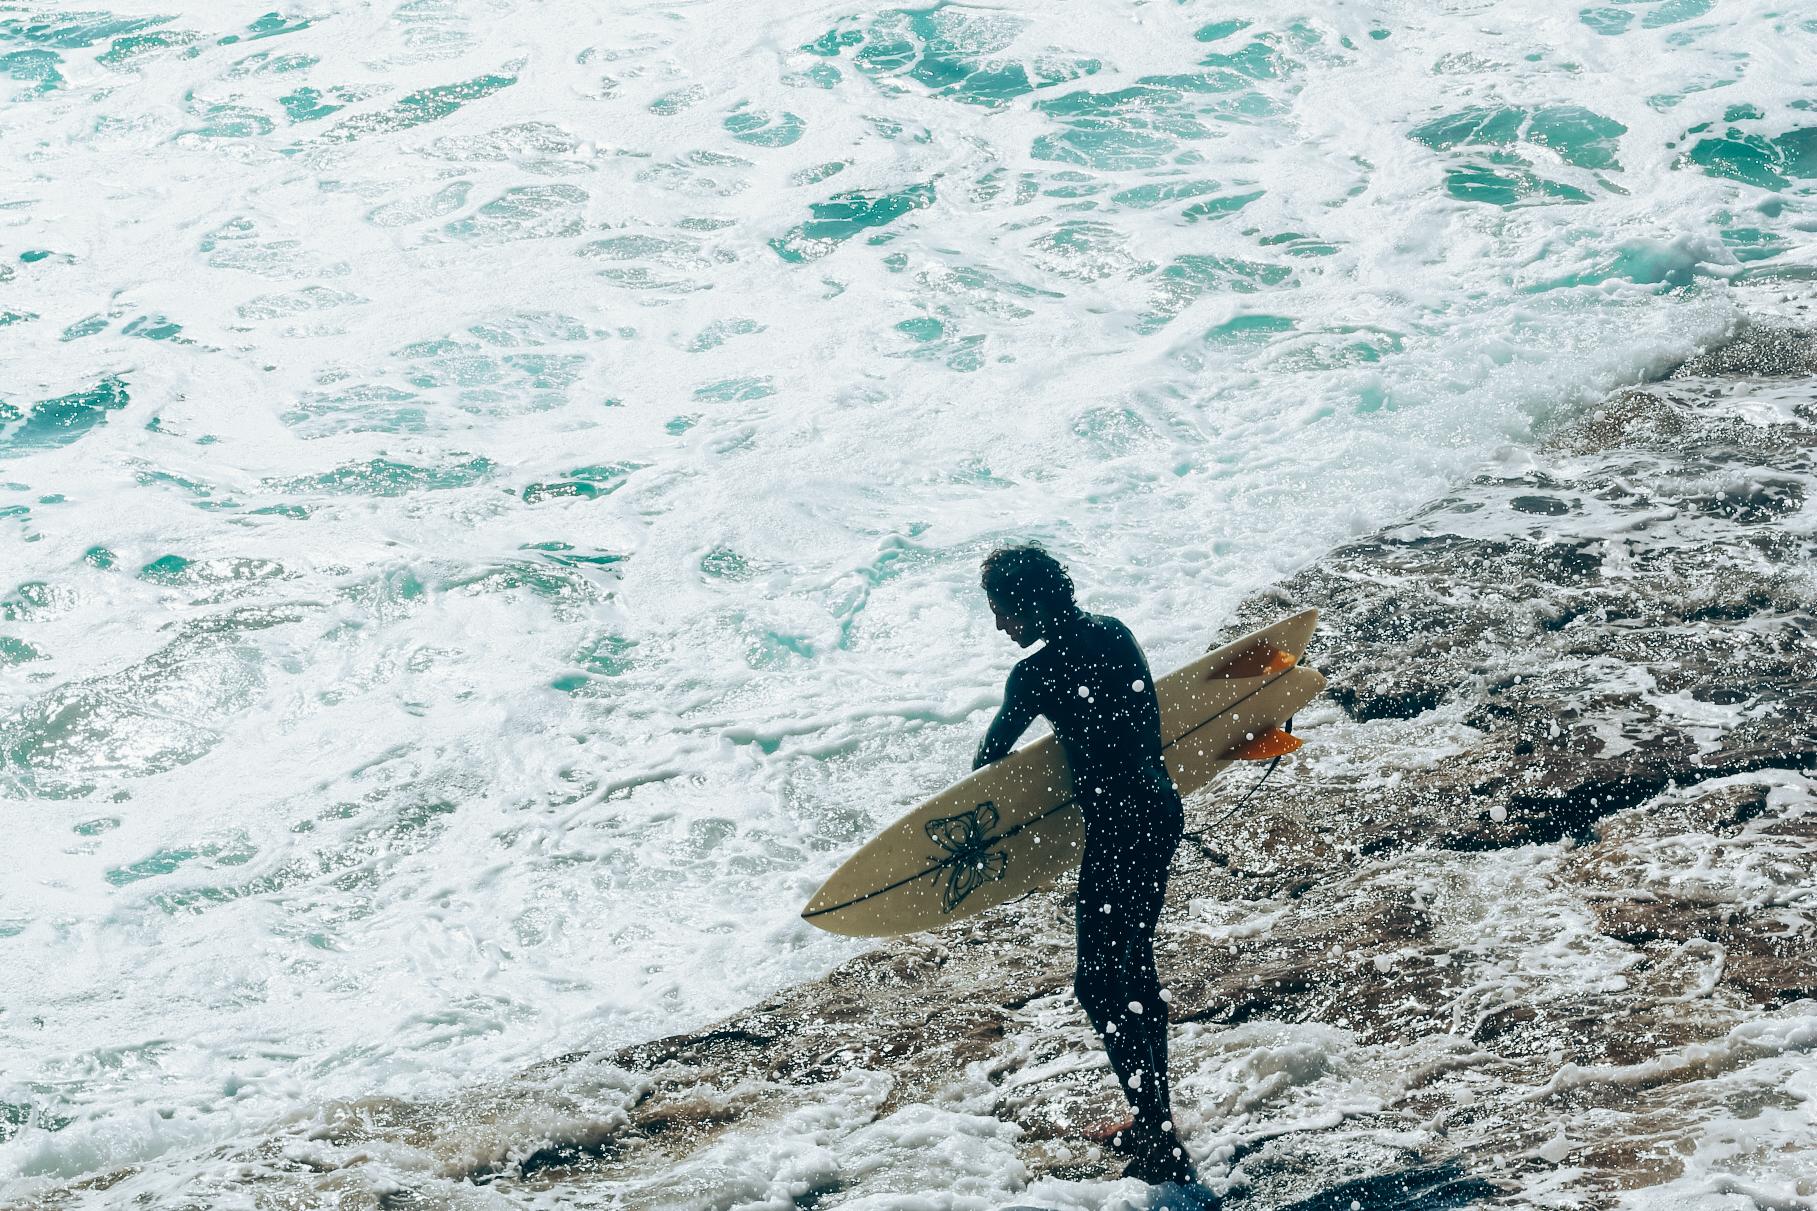 surf_reef_oct-118.jpg